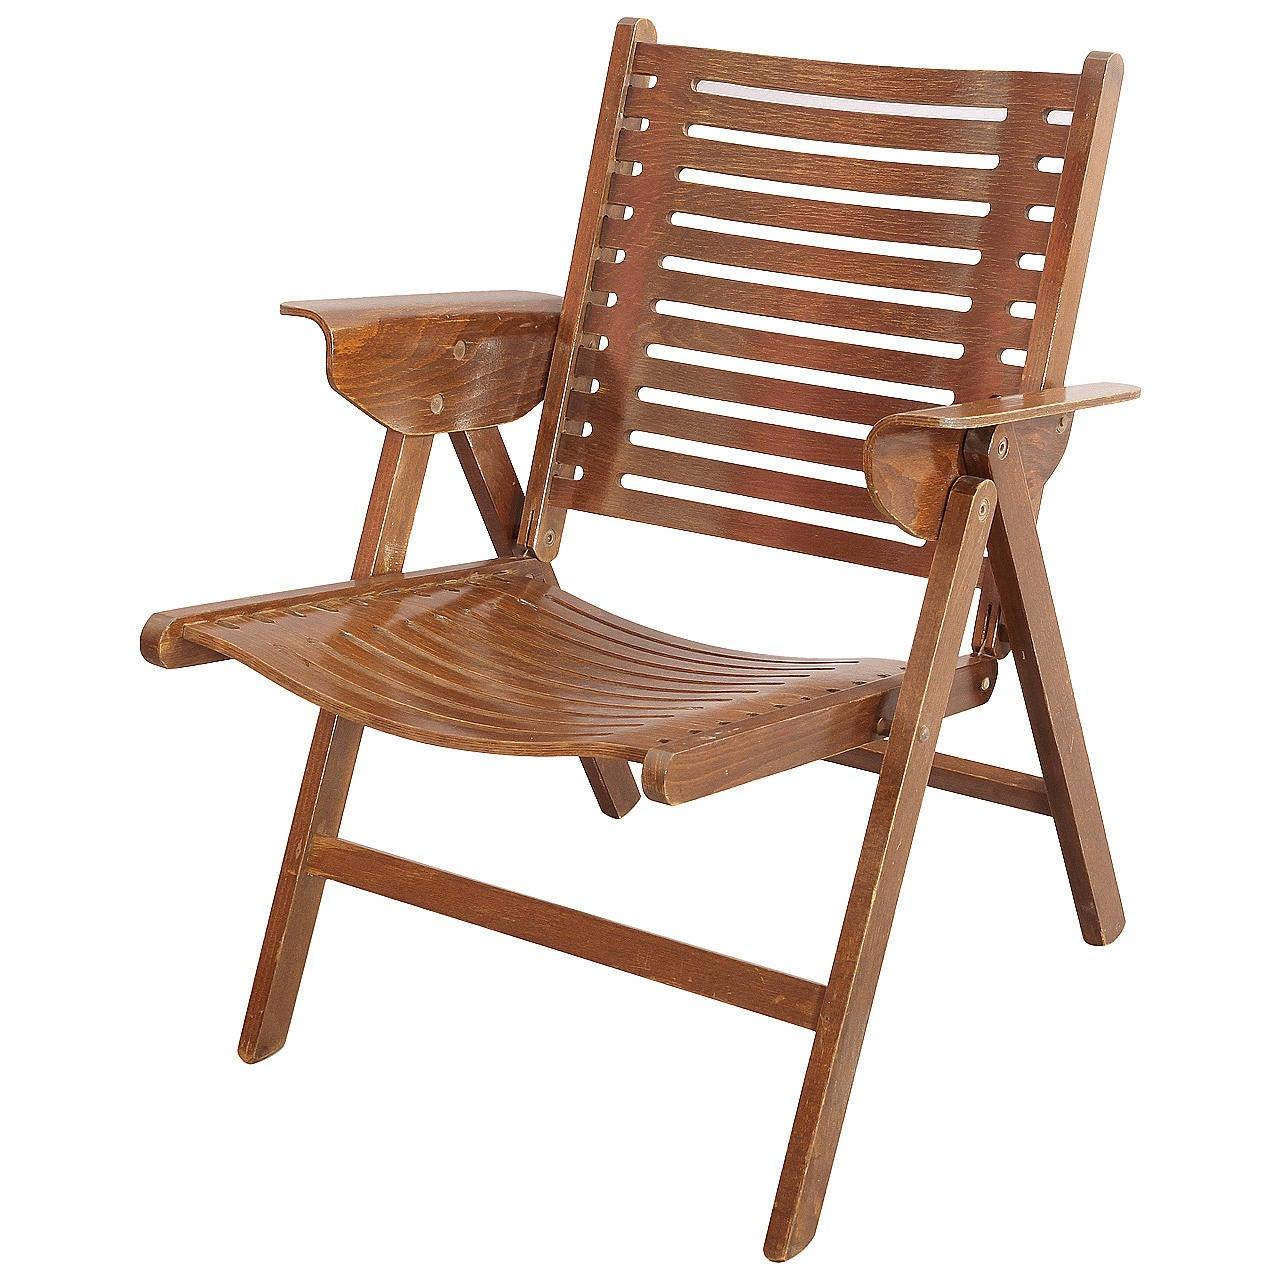 Astounding Iconic Vintage Folding Rex Lounge Chair By Niko Kralj For Theyellowbook Wood Chair Design Ideas Theyellowbookinfo